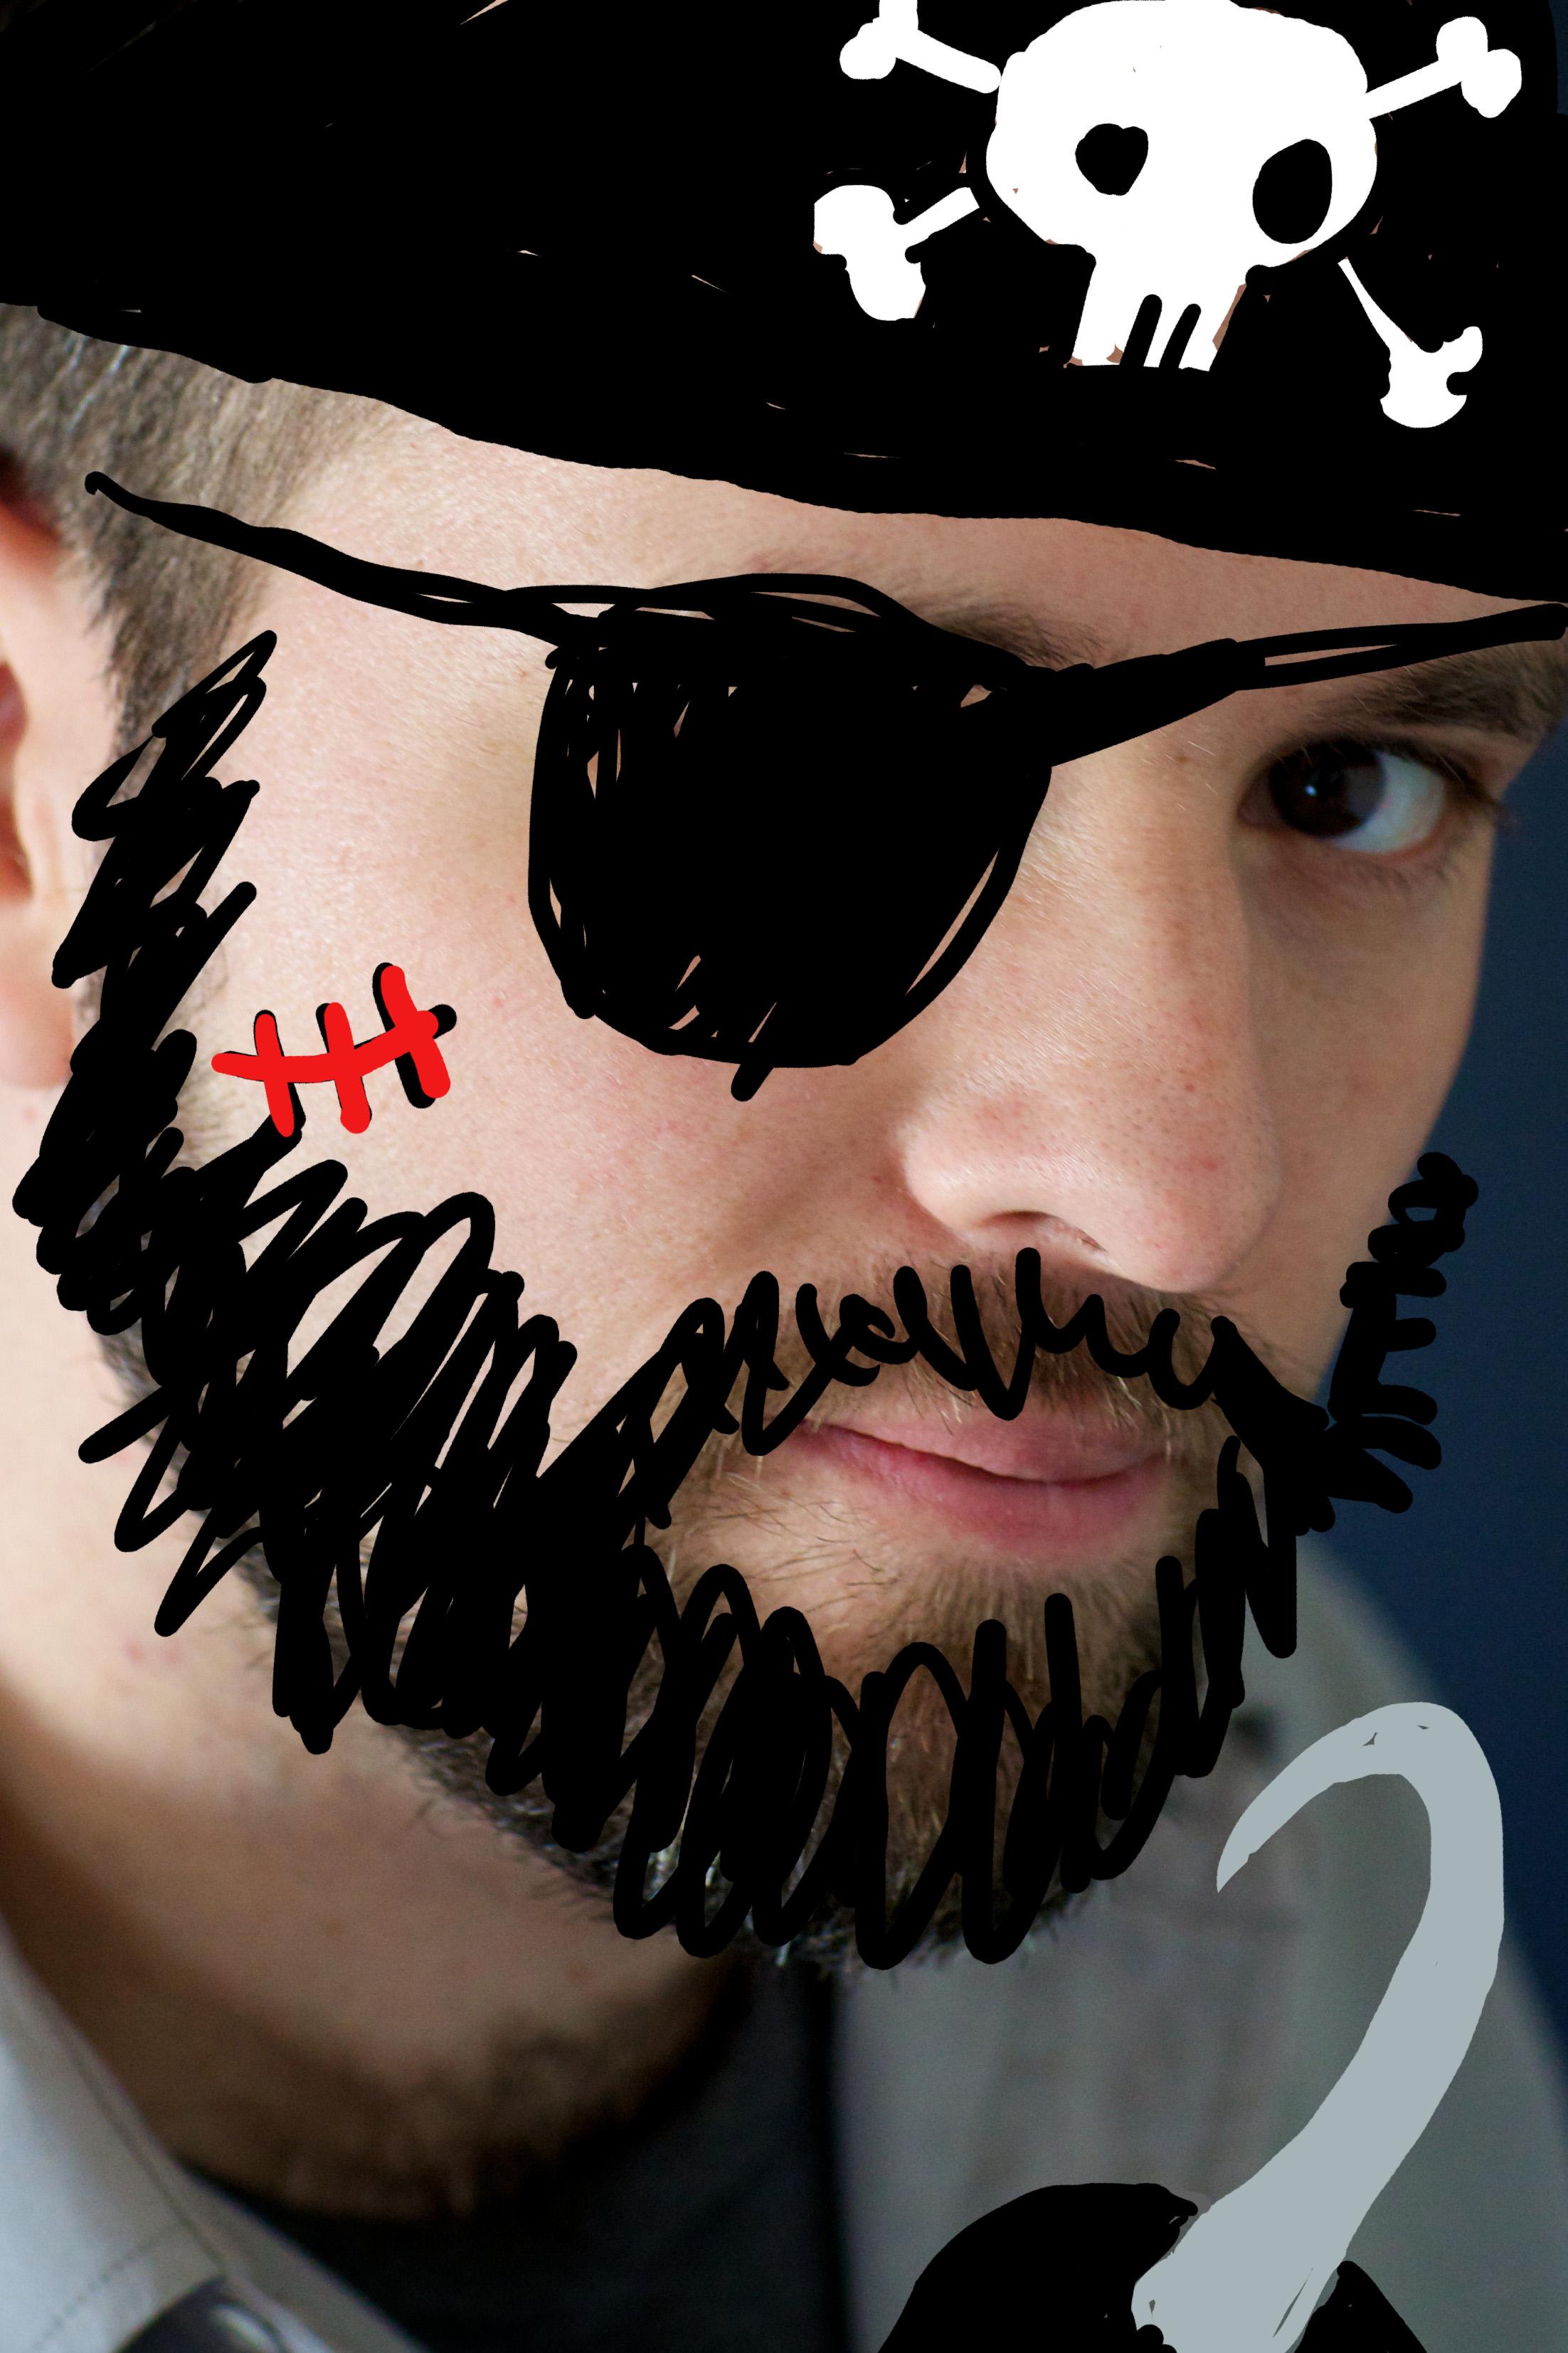 PirateAlexander